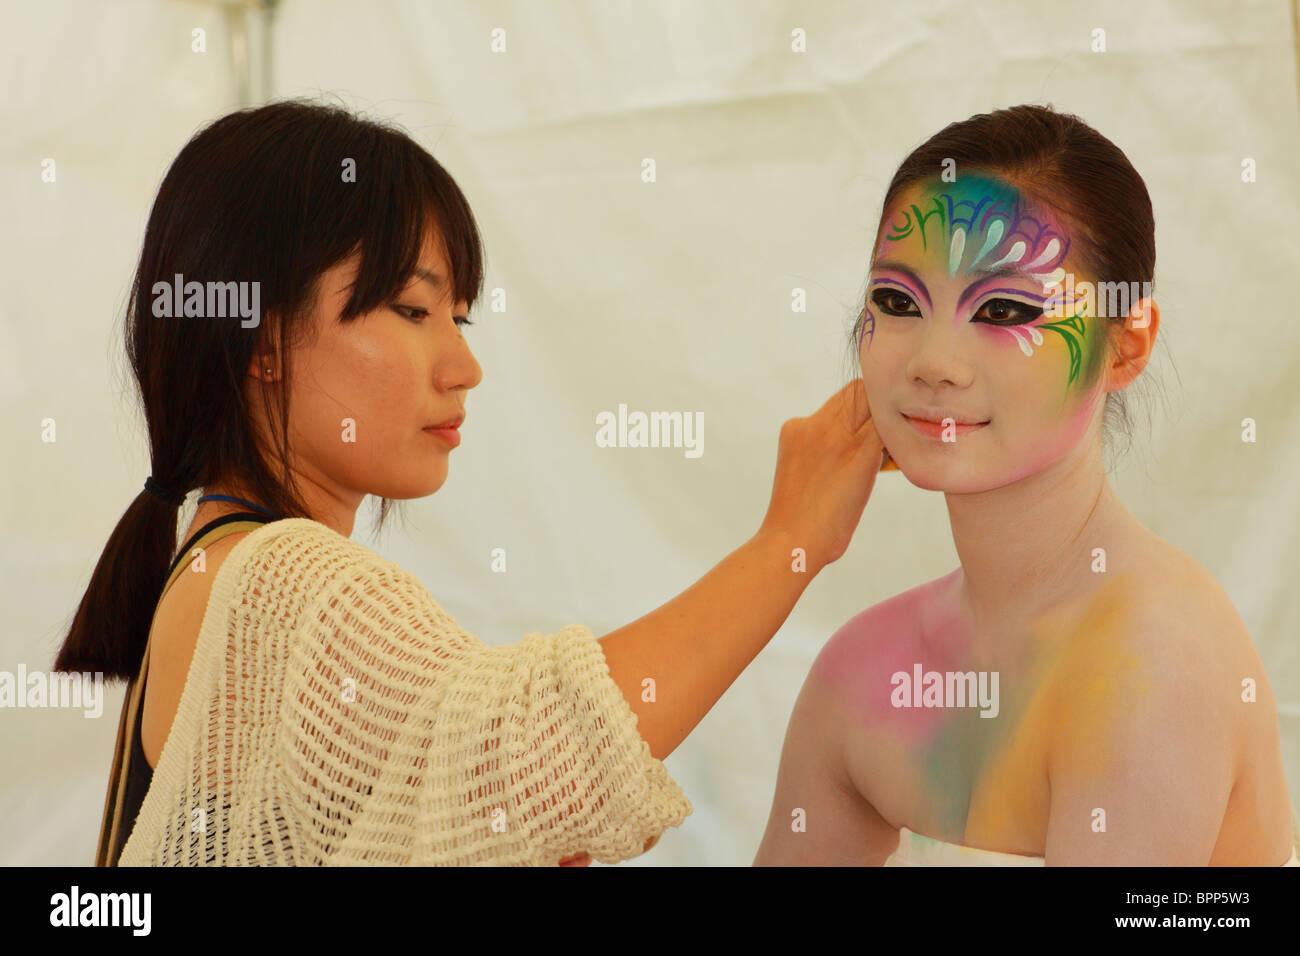 Daegu International Bodypainting Festival Stock Photo